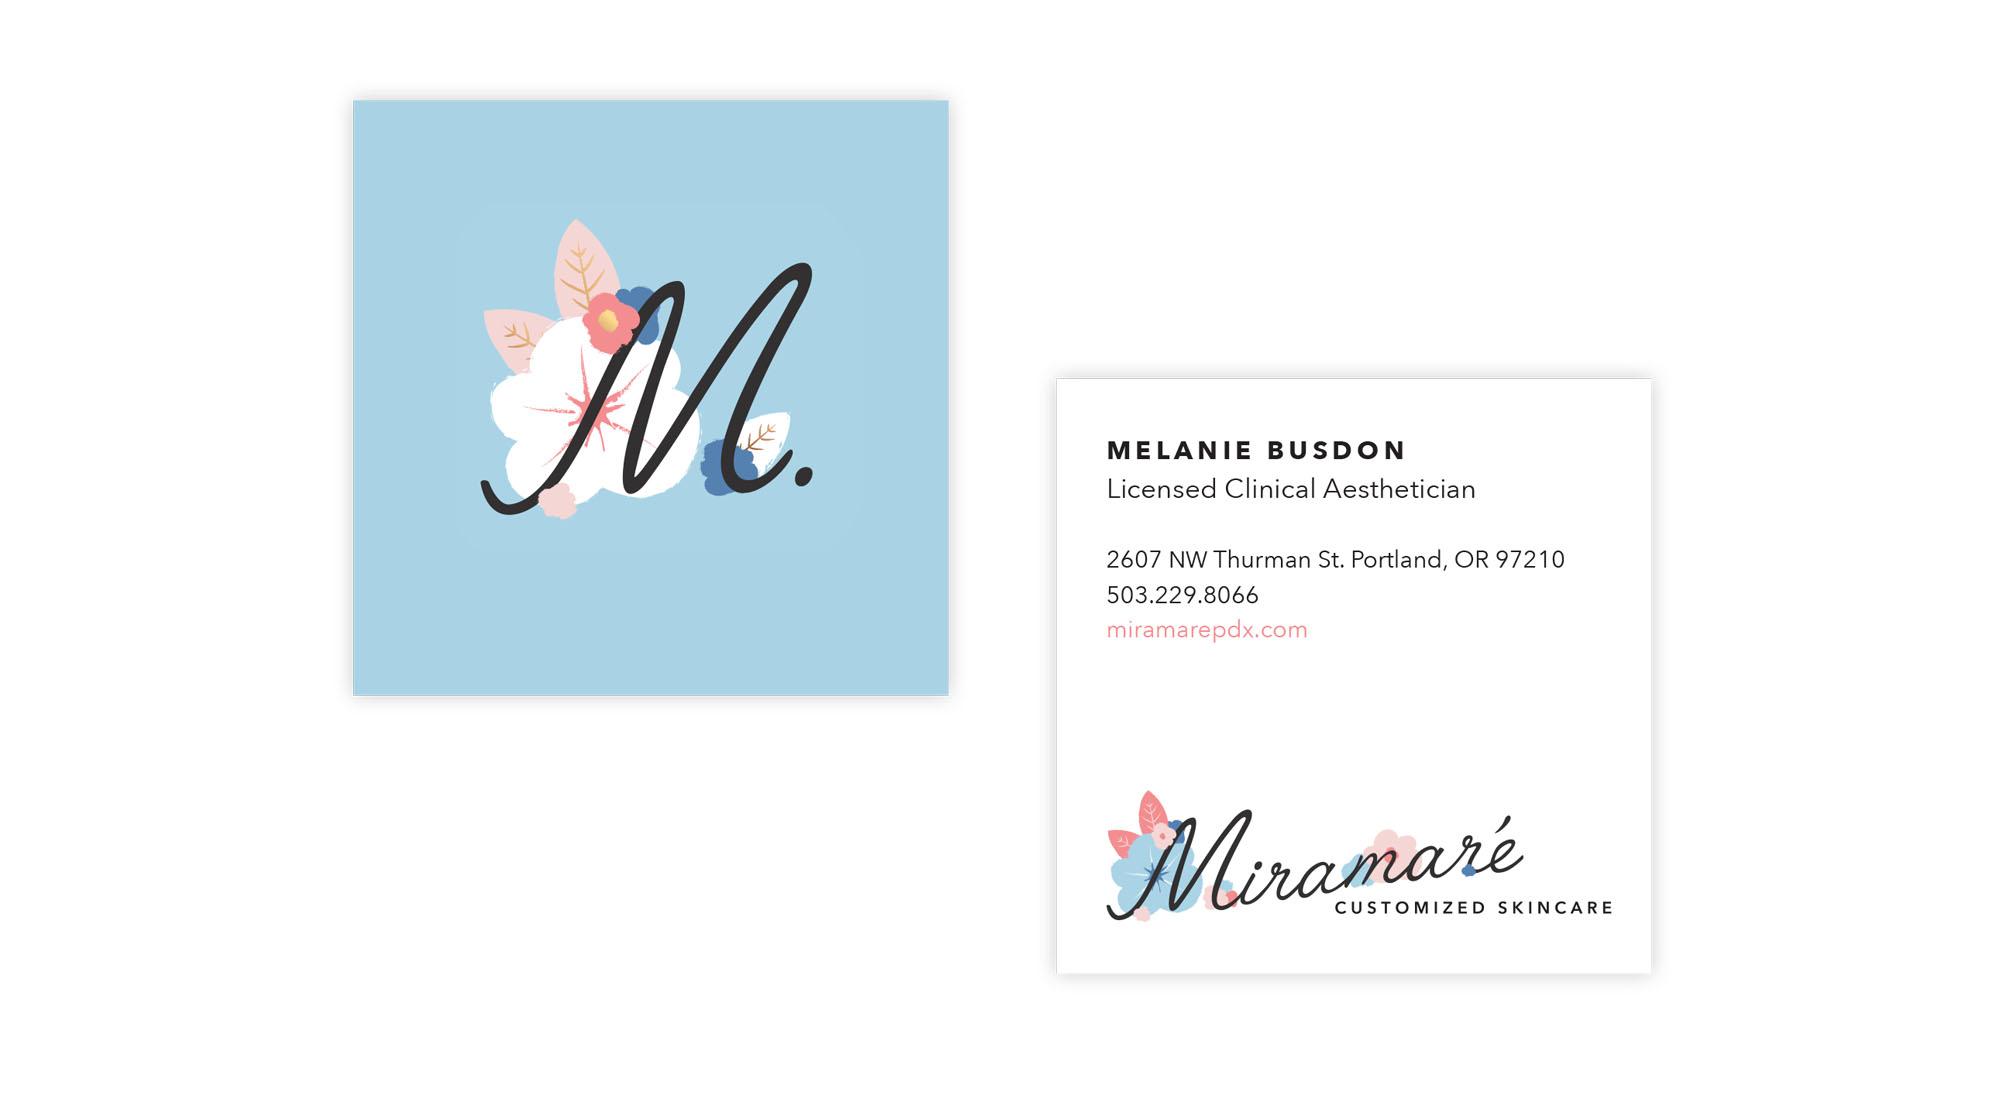 Miramare2.jpg